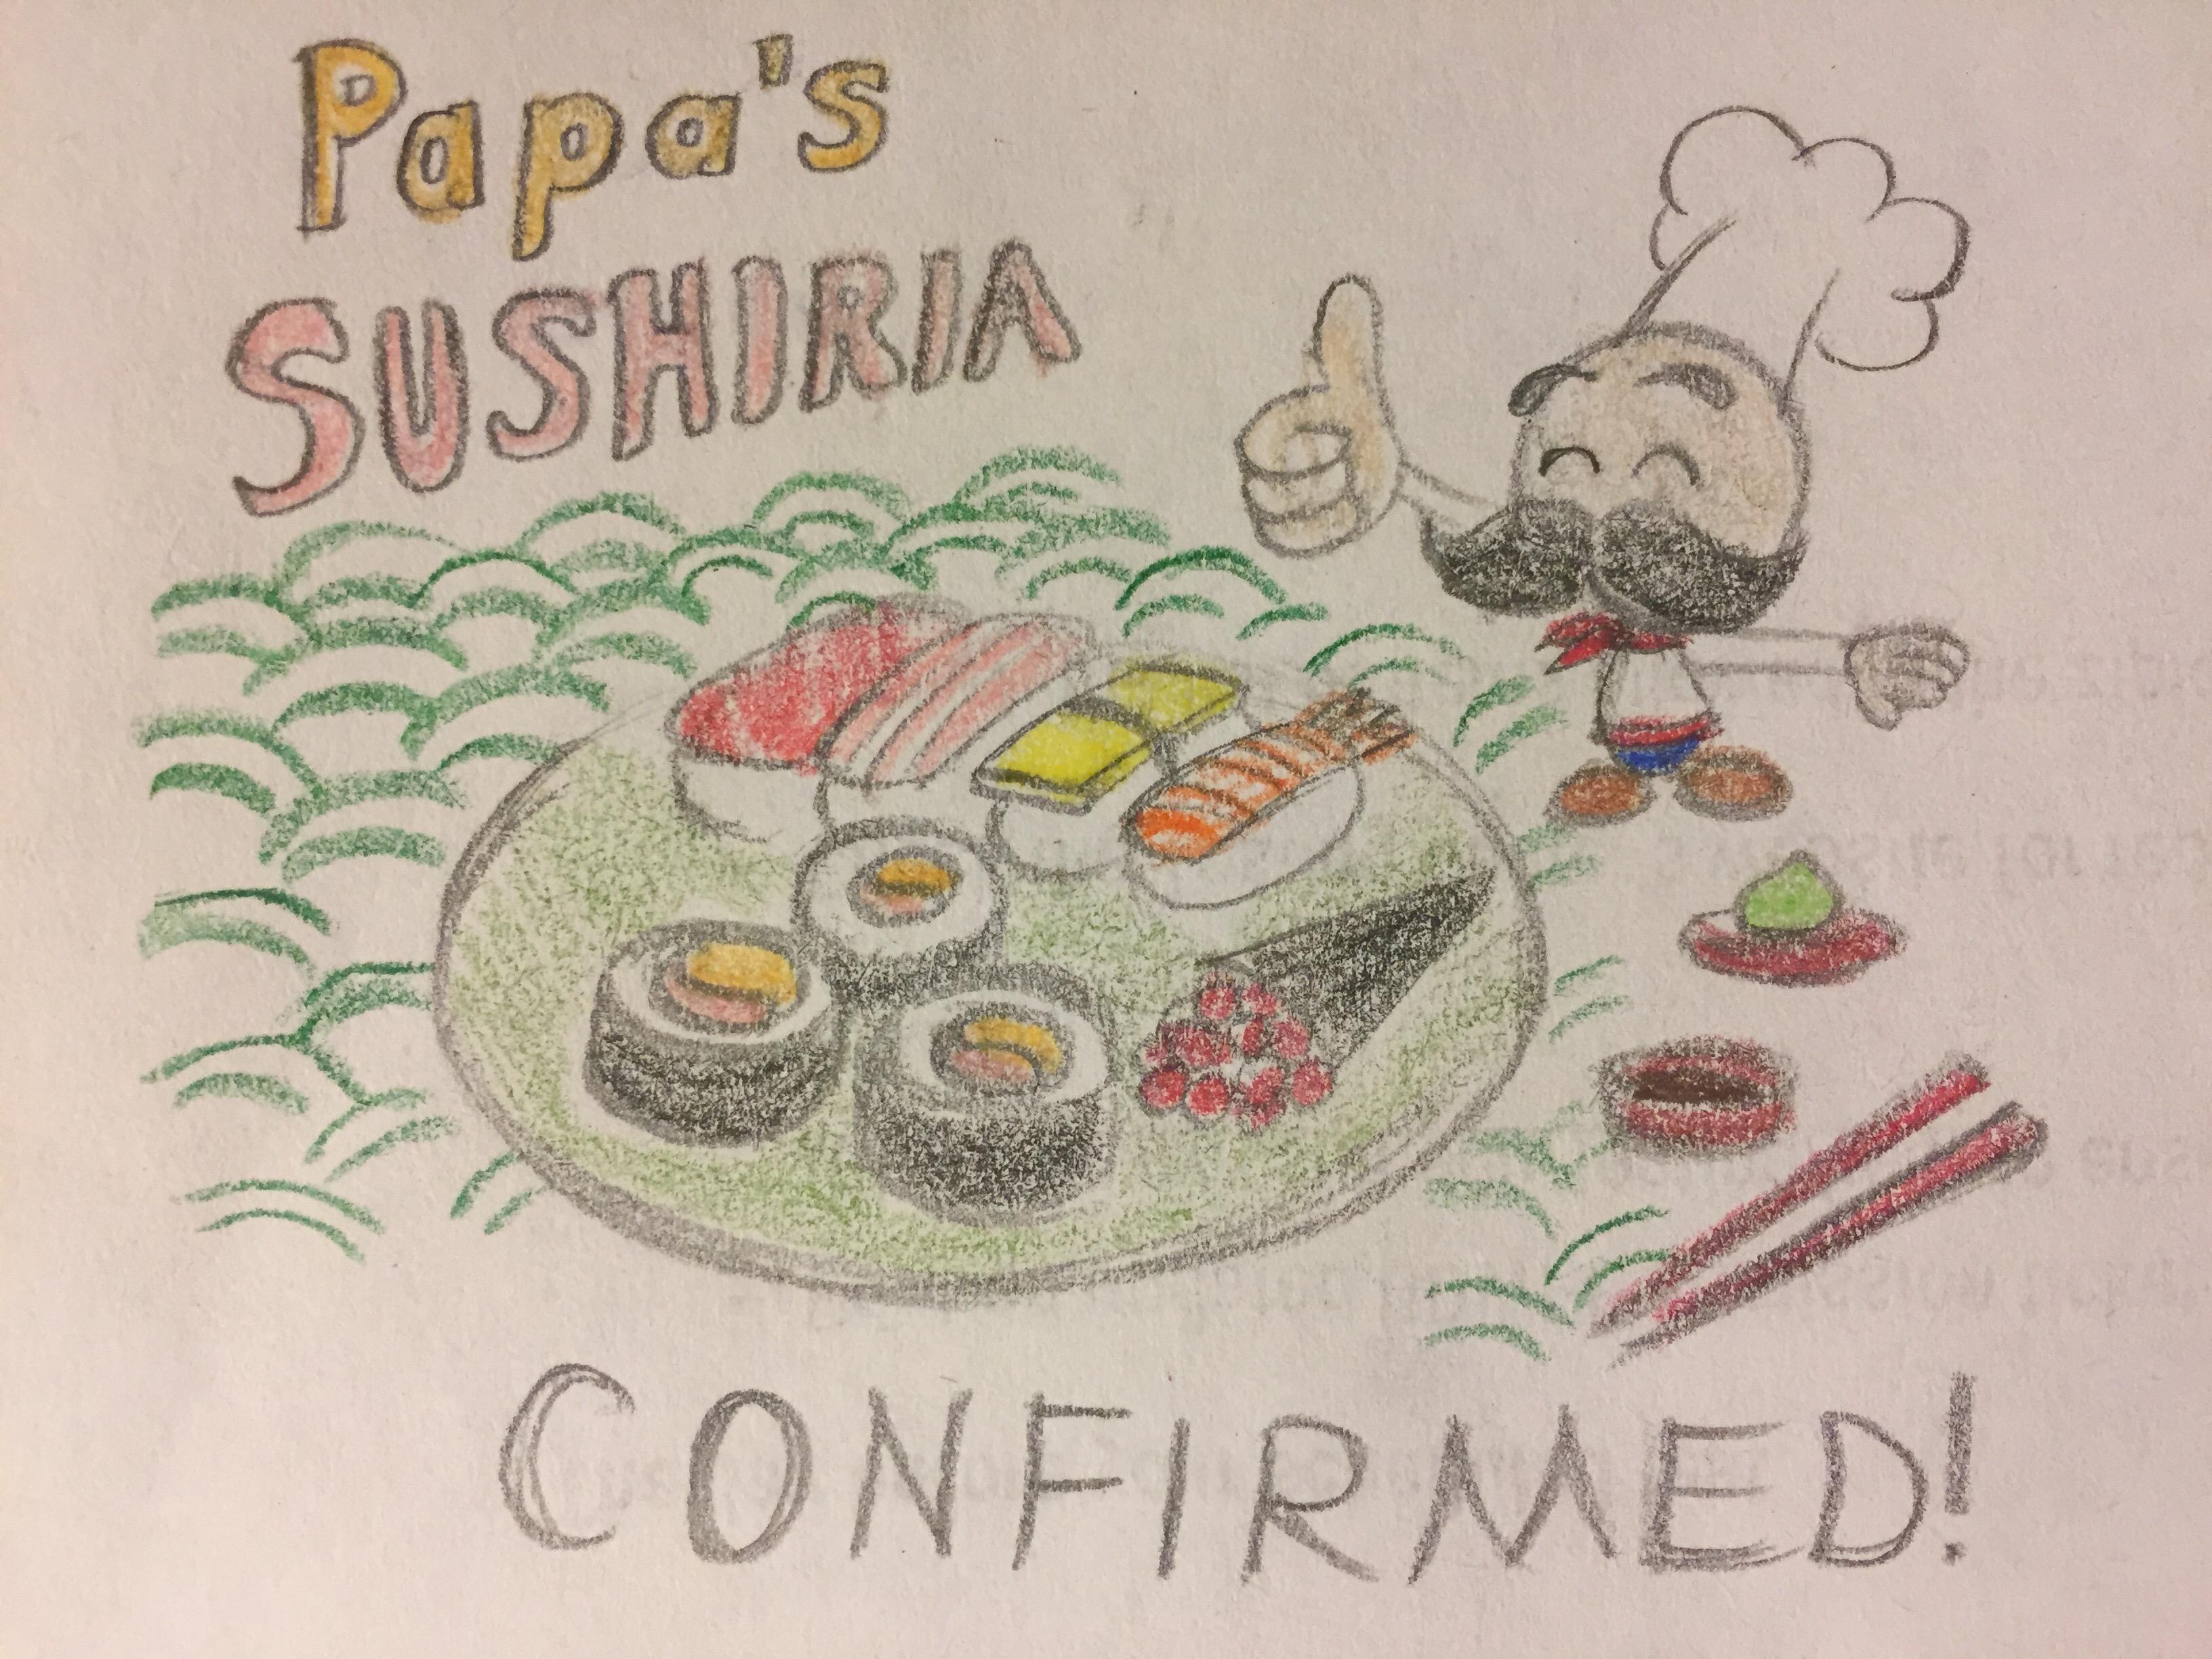 Papas Donuteria Mobile - Papa s sushiria confirmed by pinkduskstone papa s sushiria confirmed by pinkduskstone